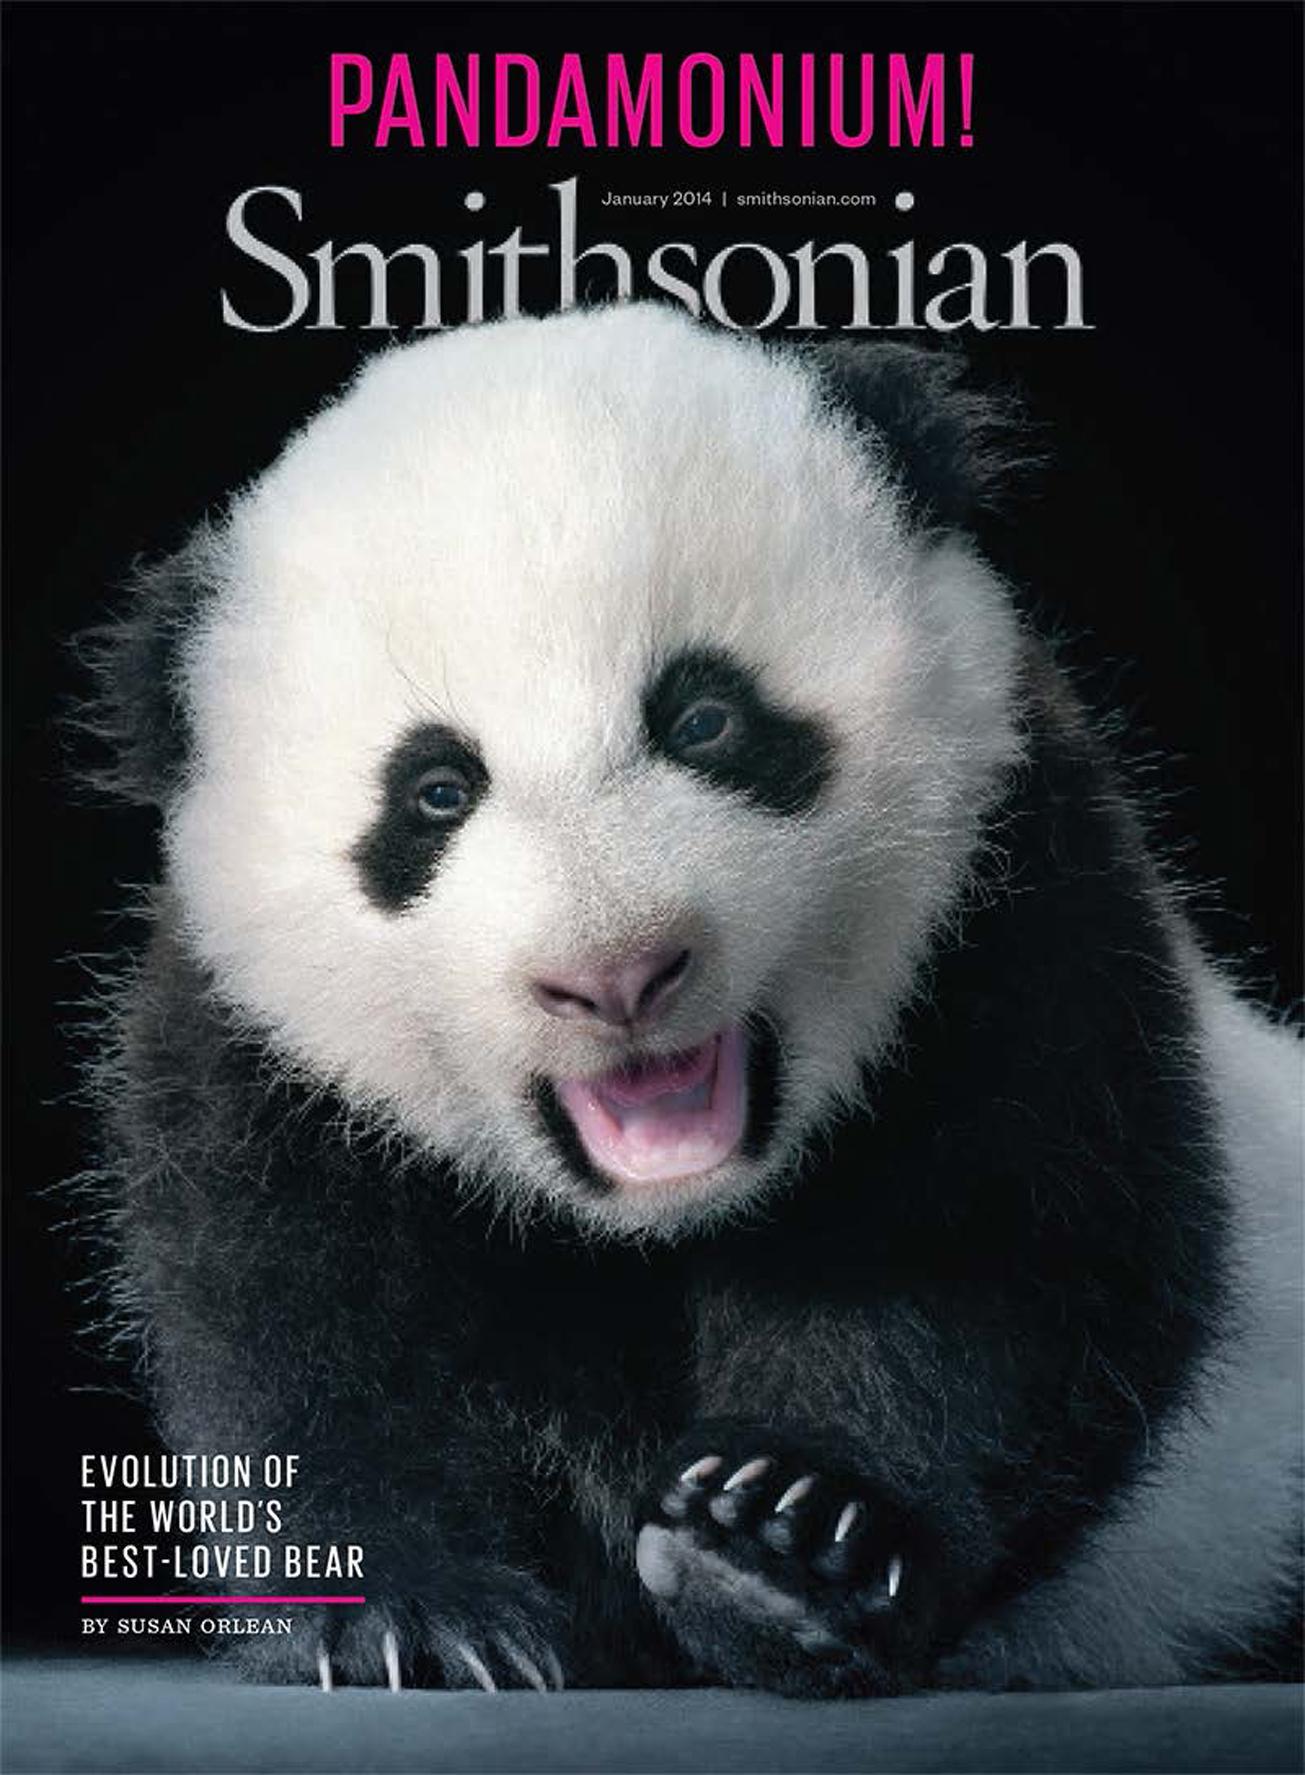 Panda!_Page_1 copy.jpg